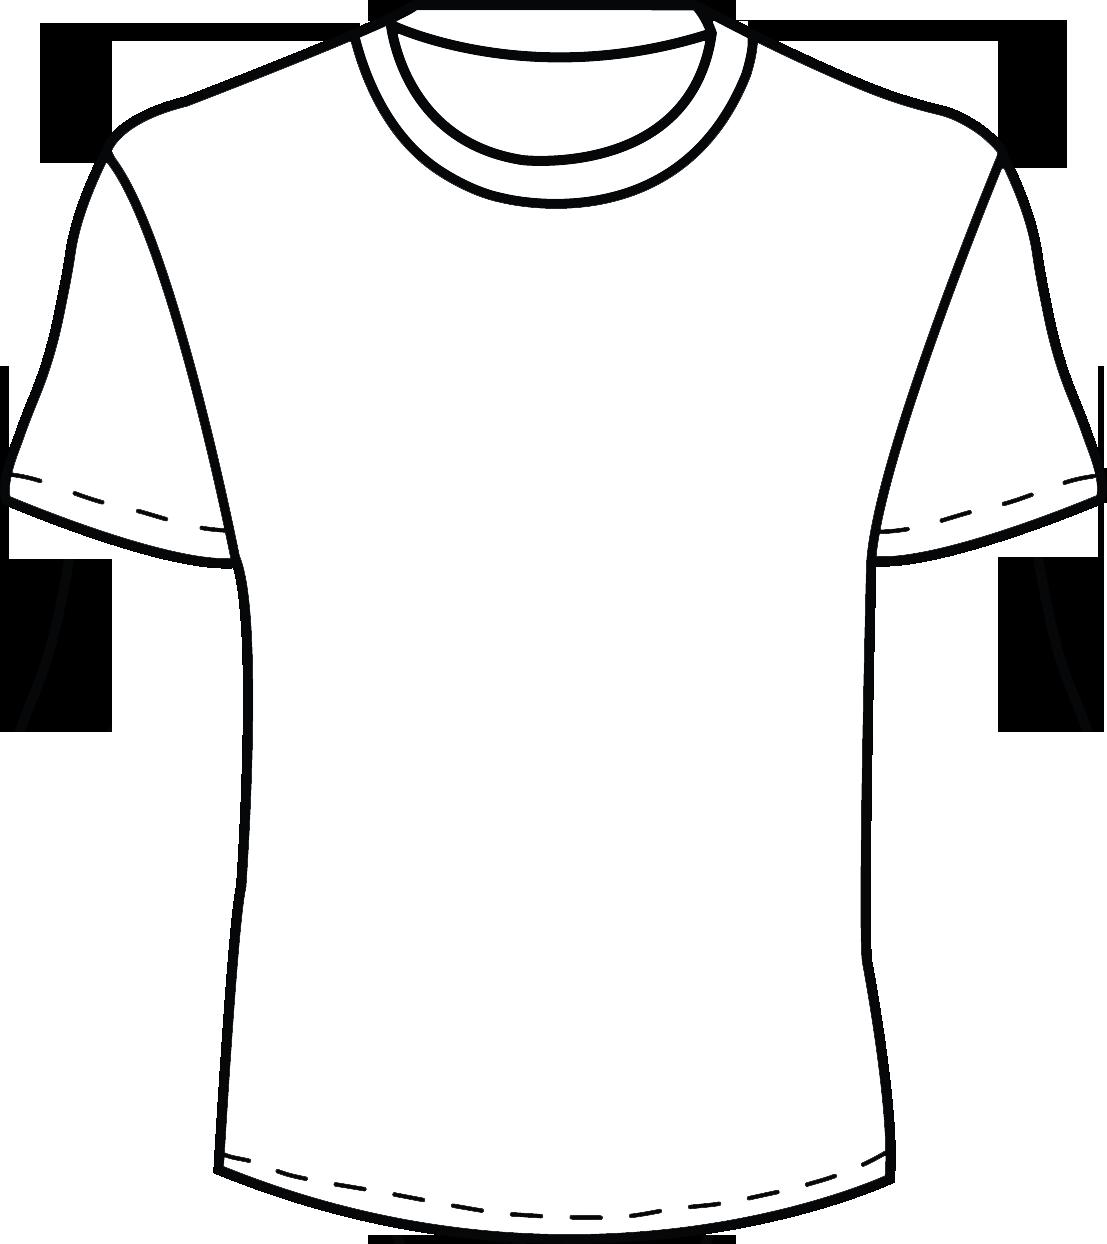 одежда рисунки футболка брянской области